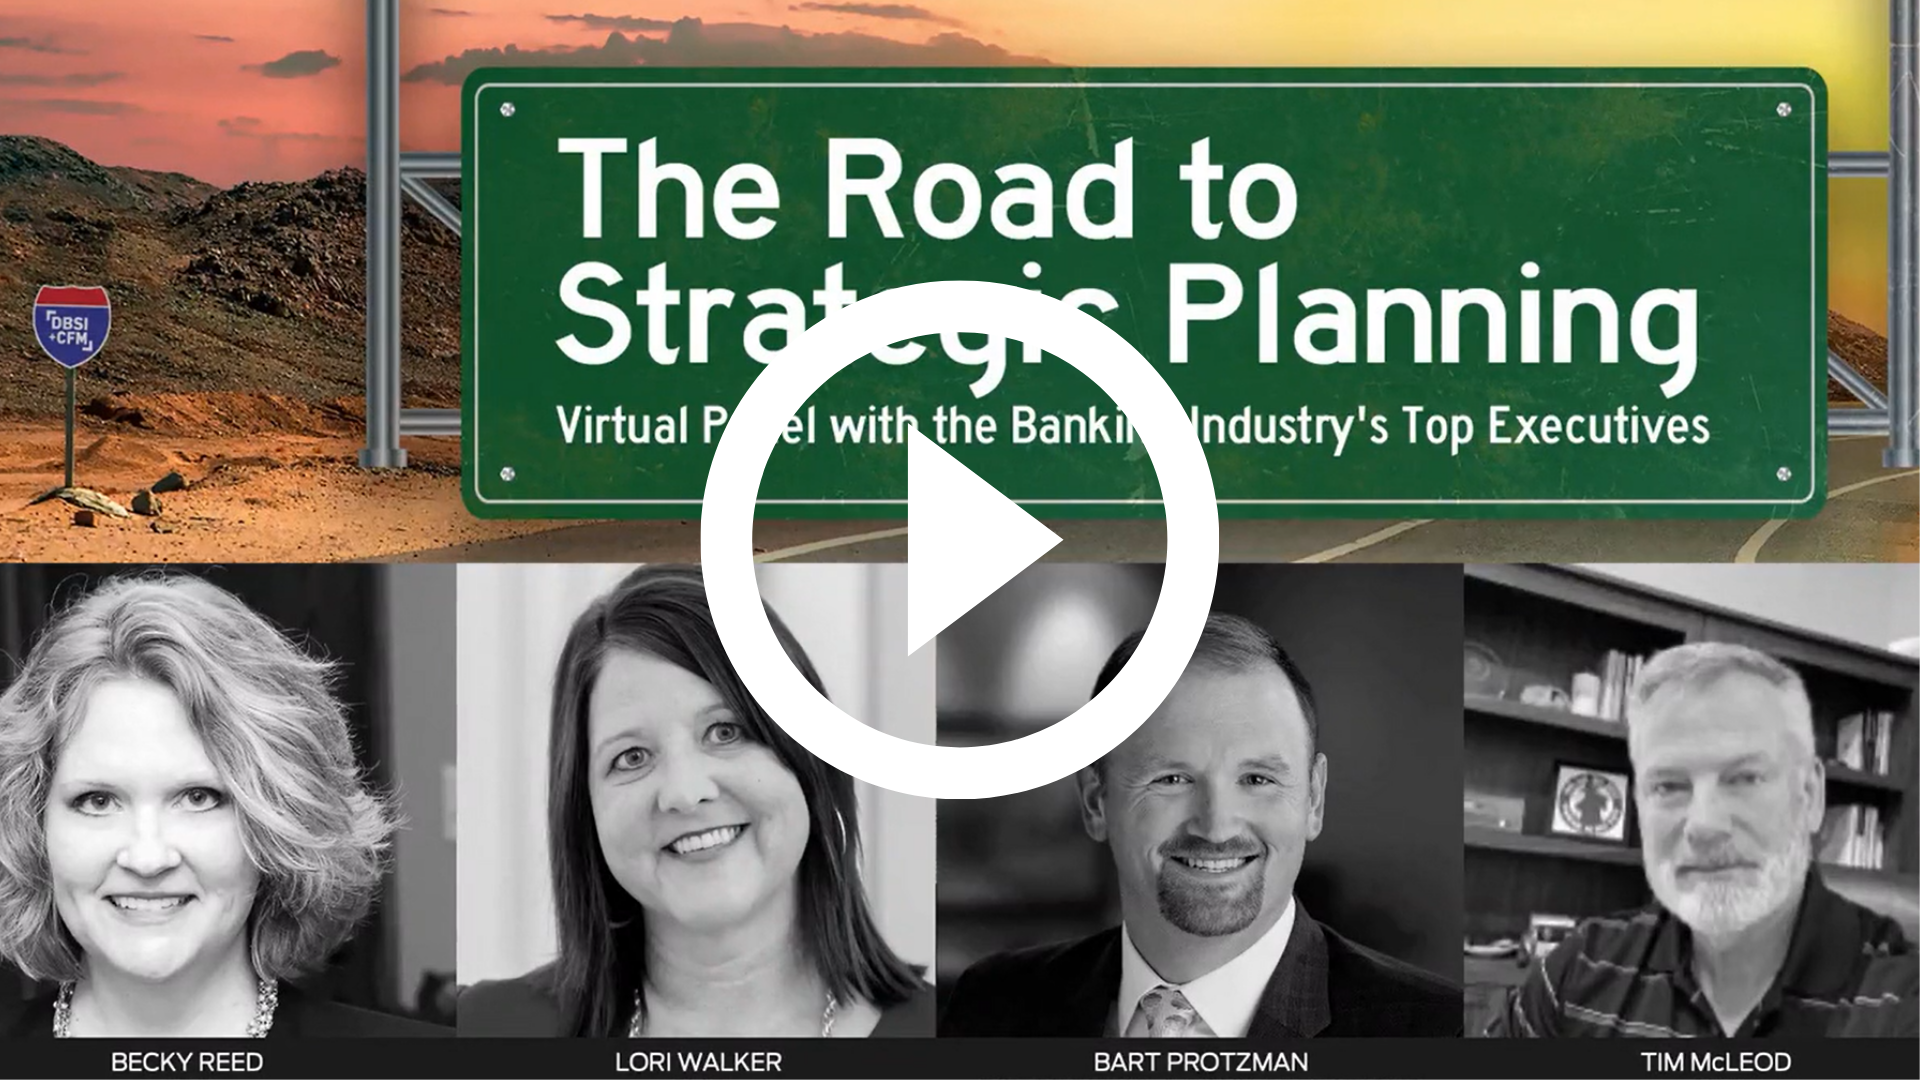 The Road to Strategic Planning Webinar Recording